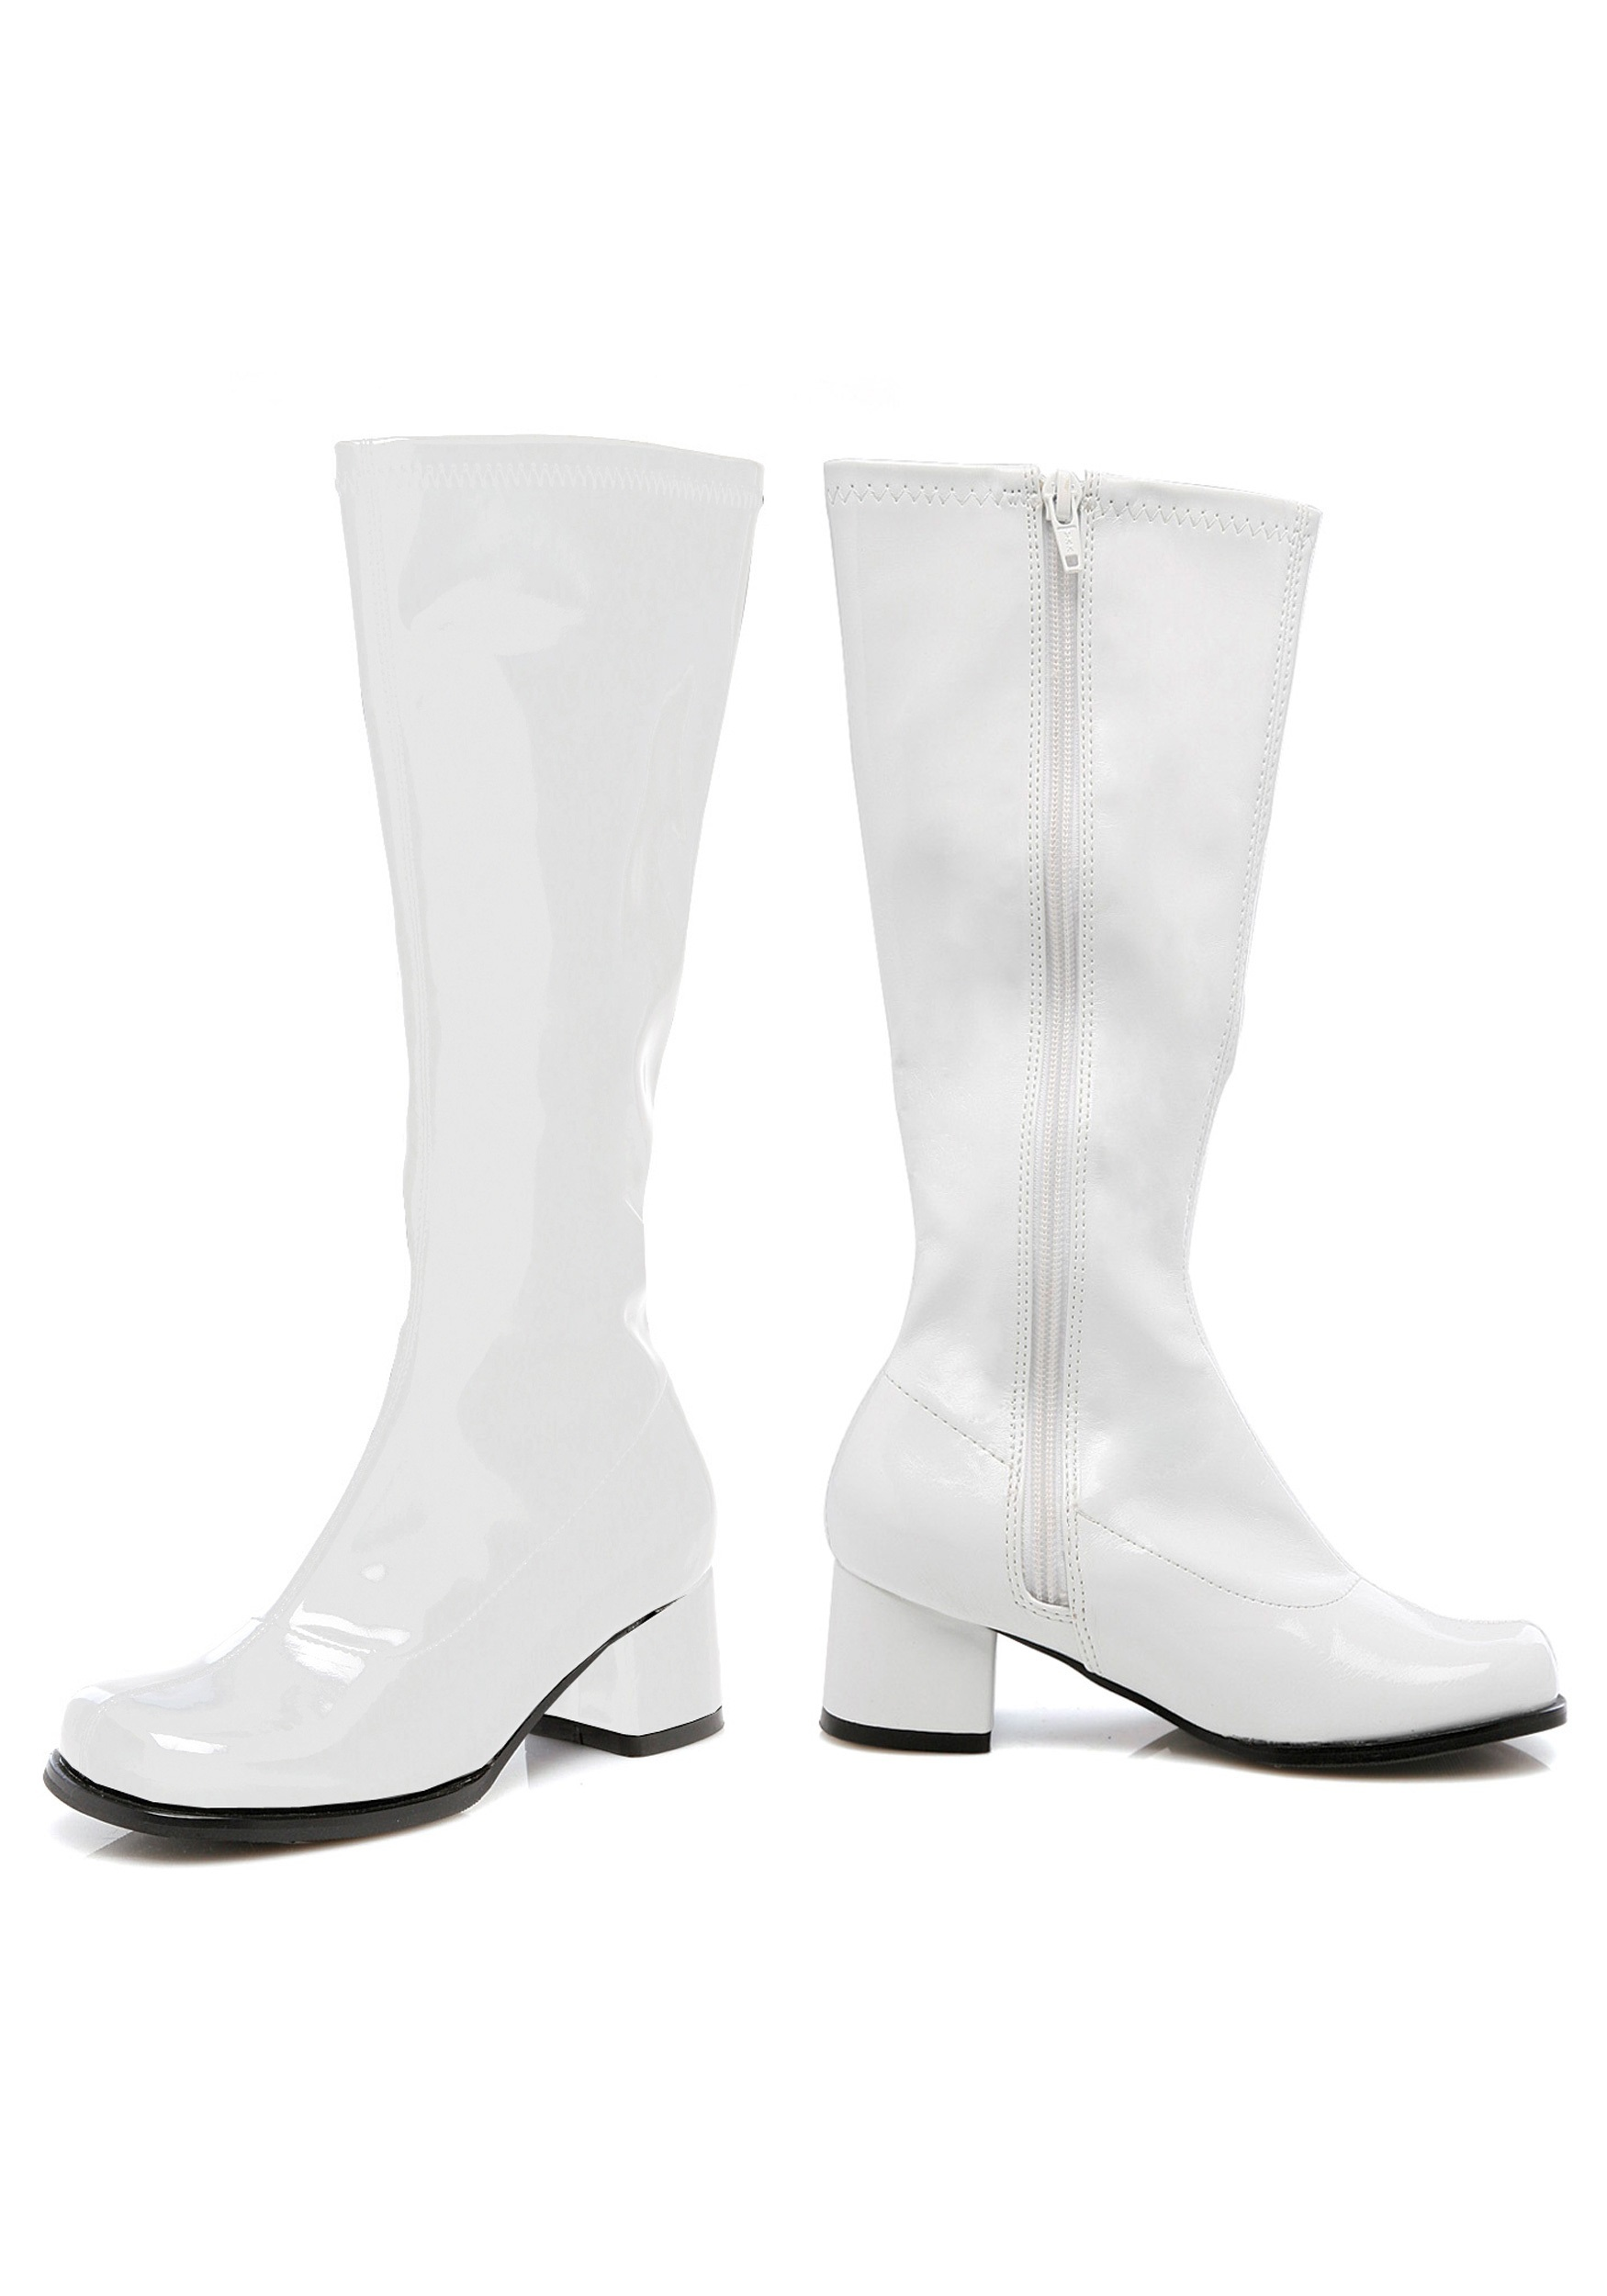 FUN Costumes - Toddler White Gogo Boots